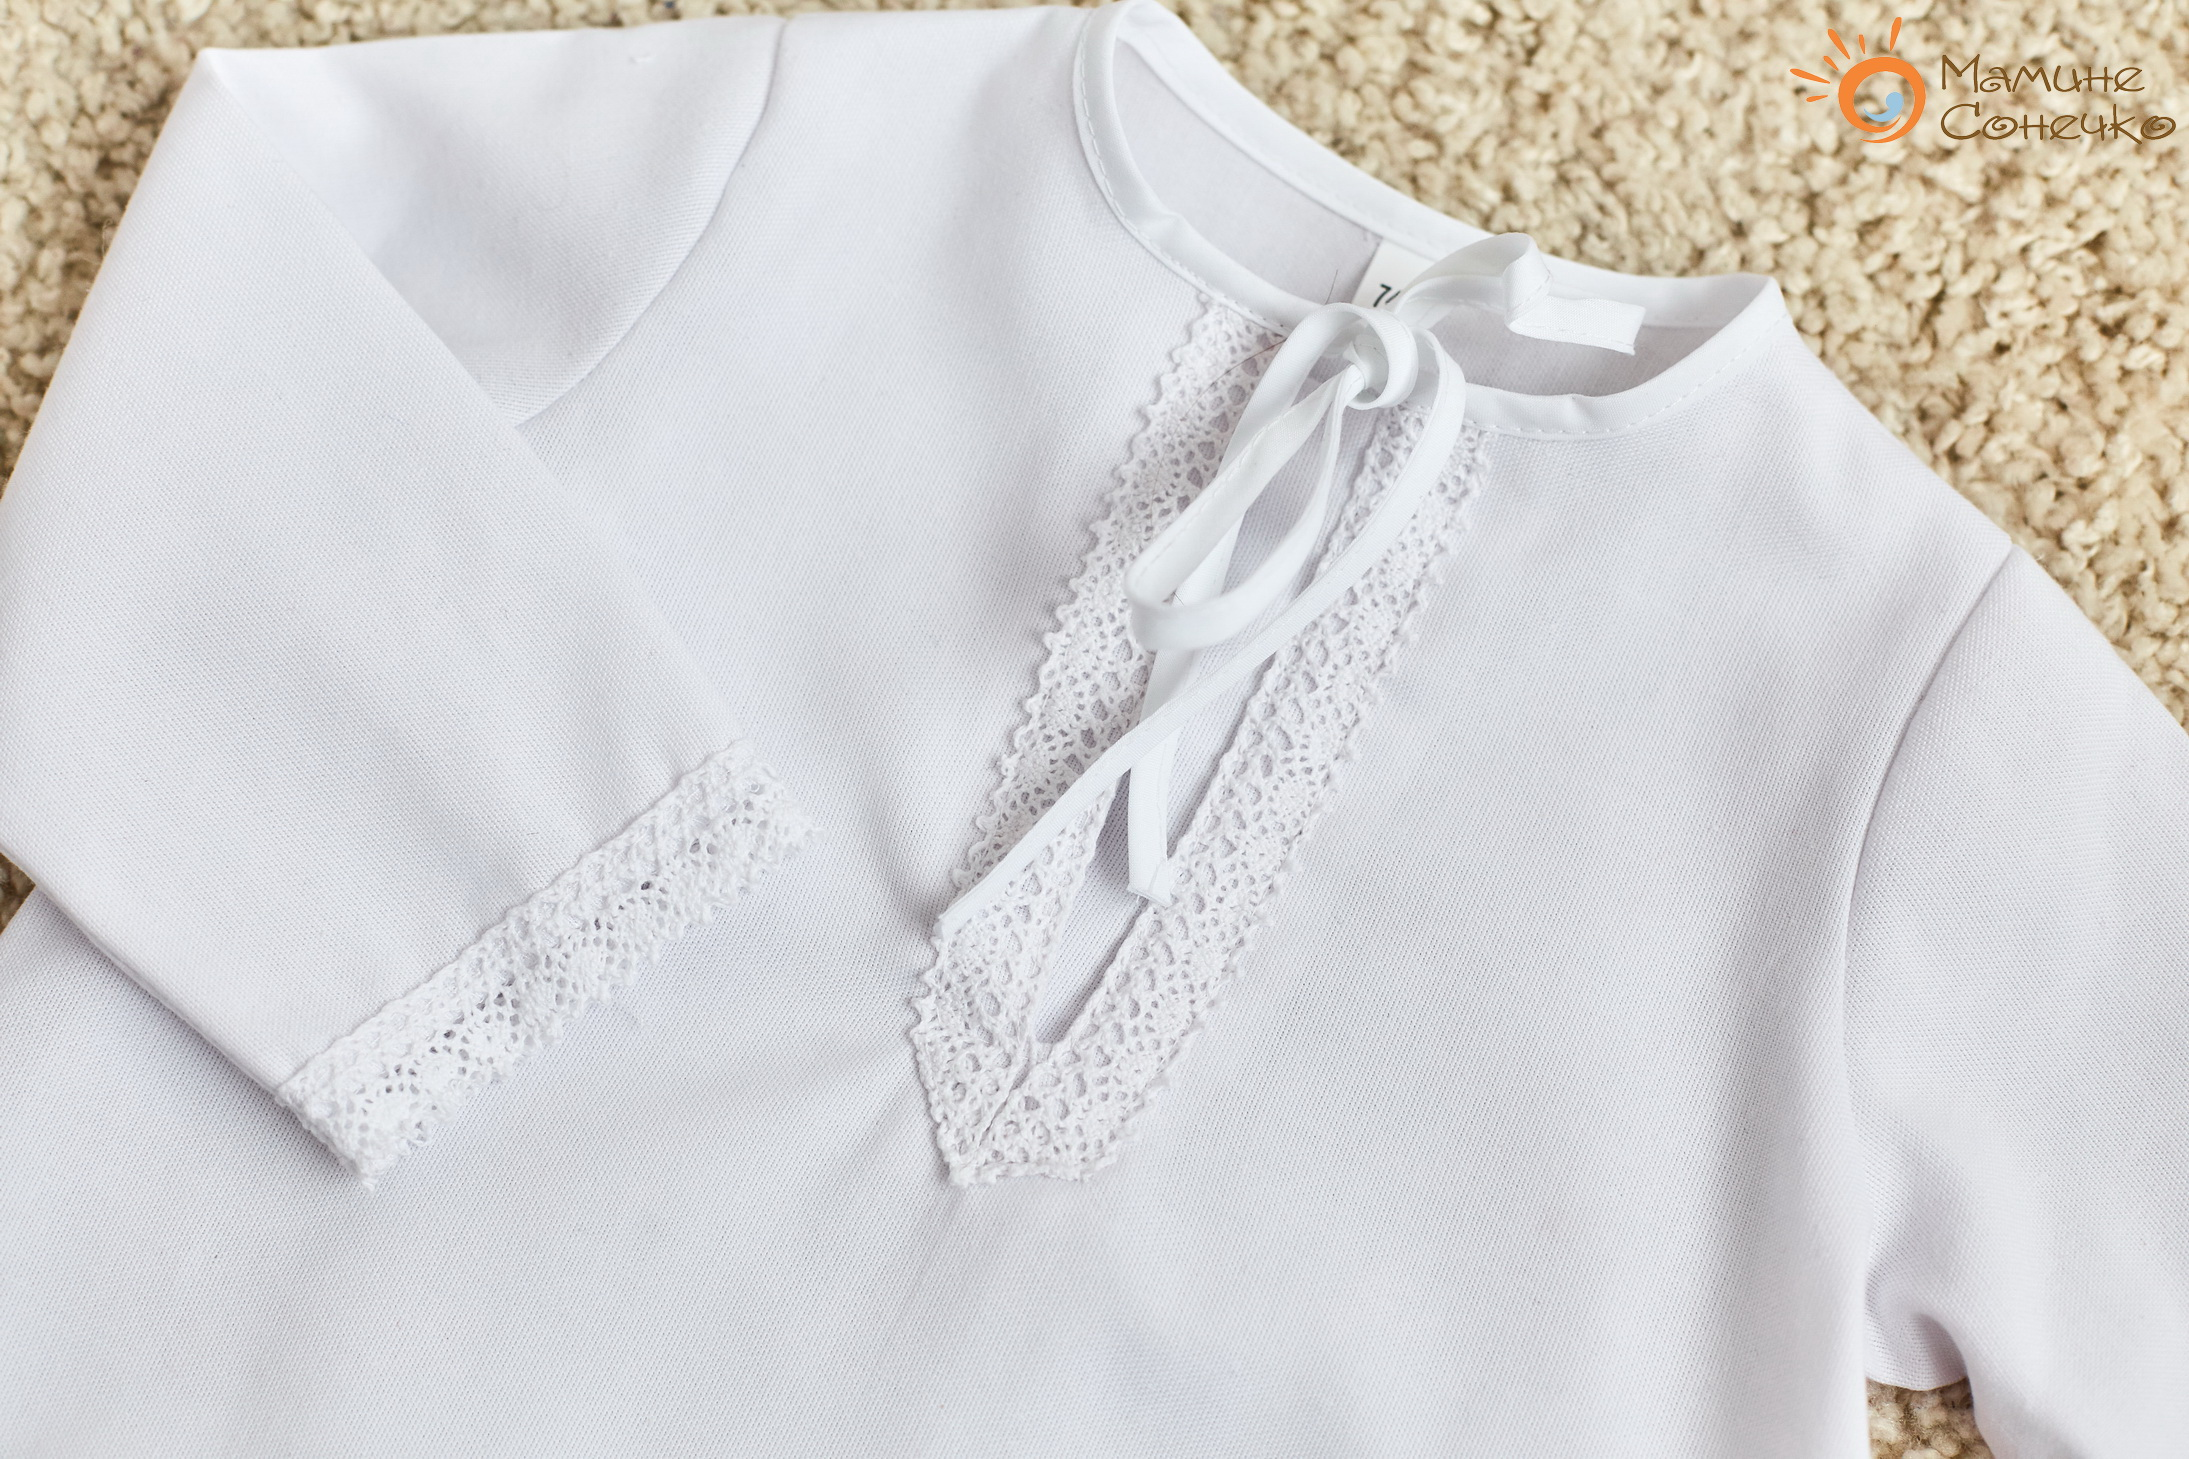 одяг на хрестини для хлопчика